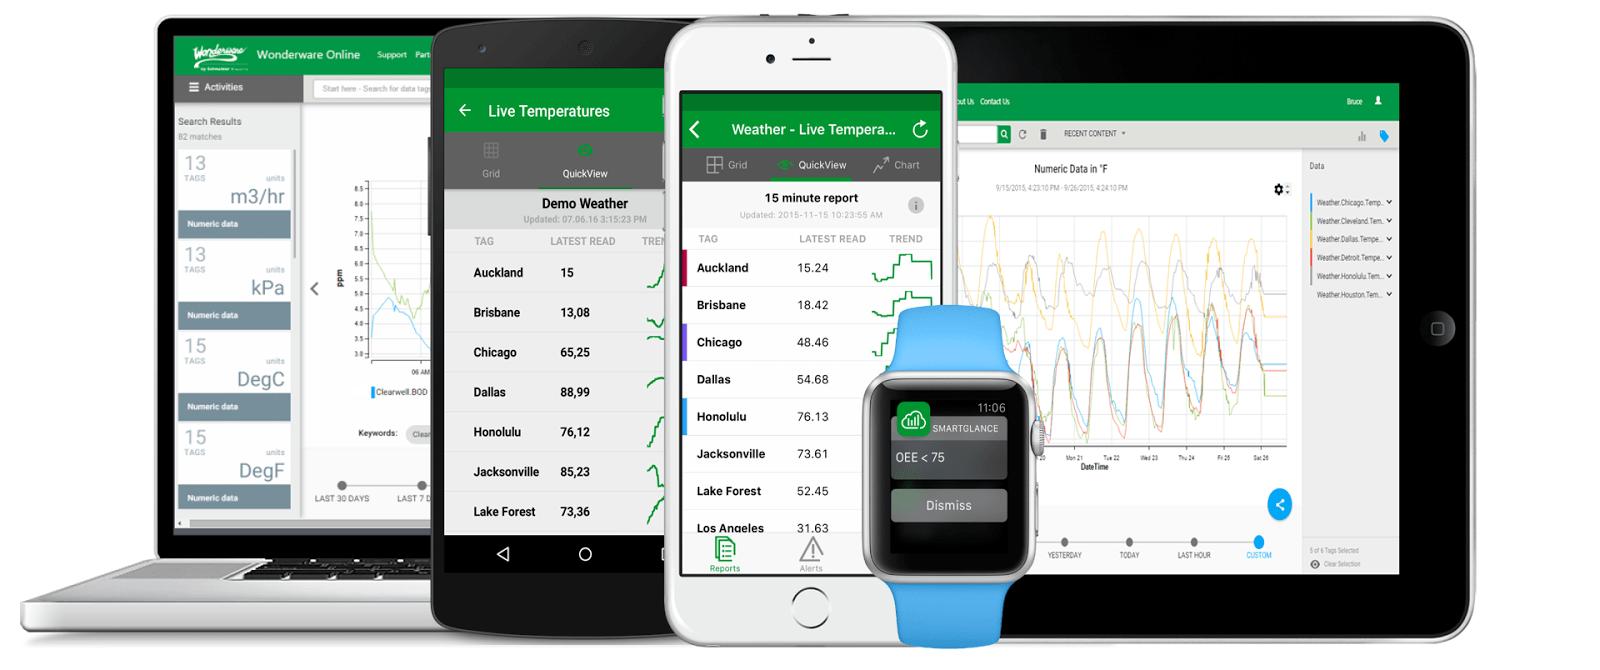 Wonderware Smart Screens Applications